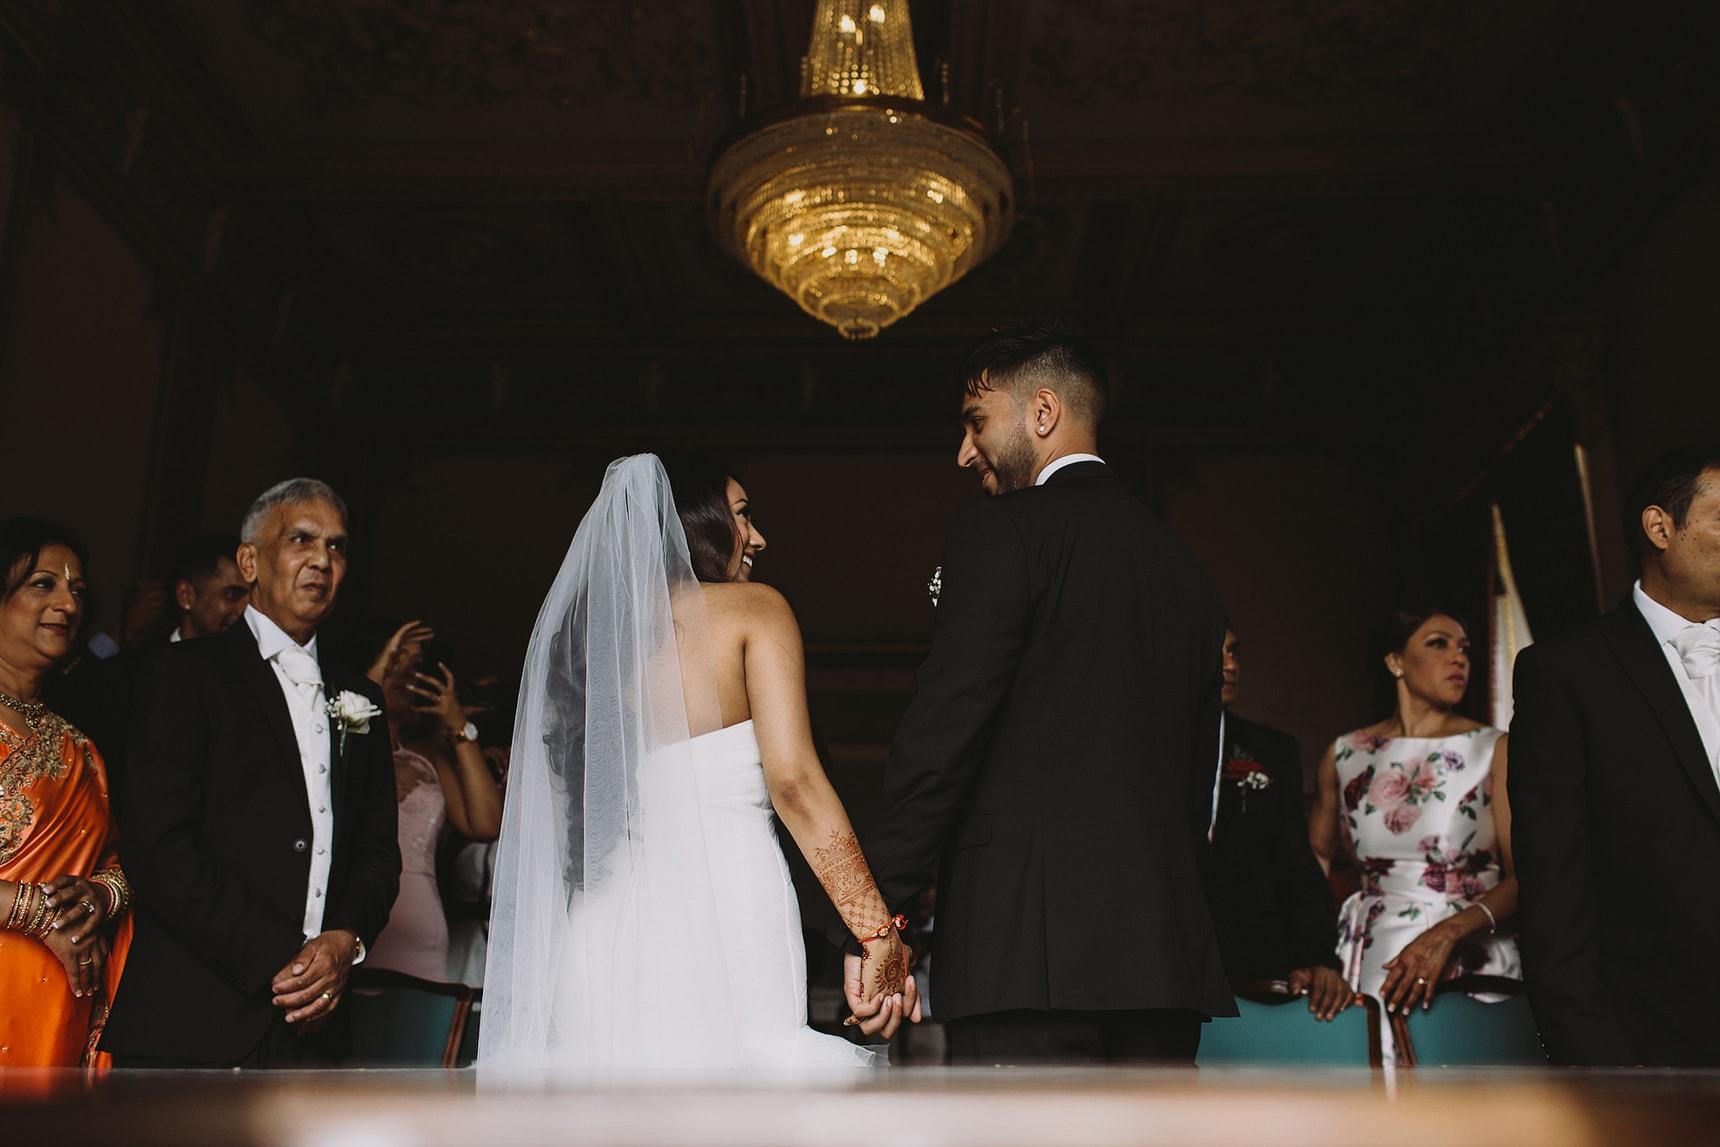 hylands house wedding photography essex